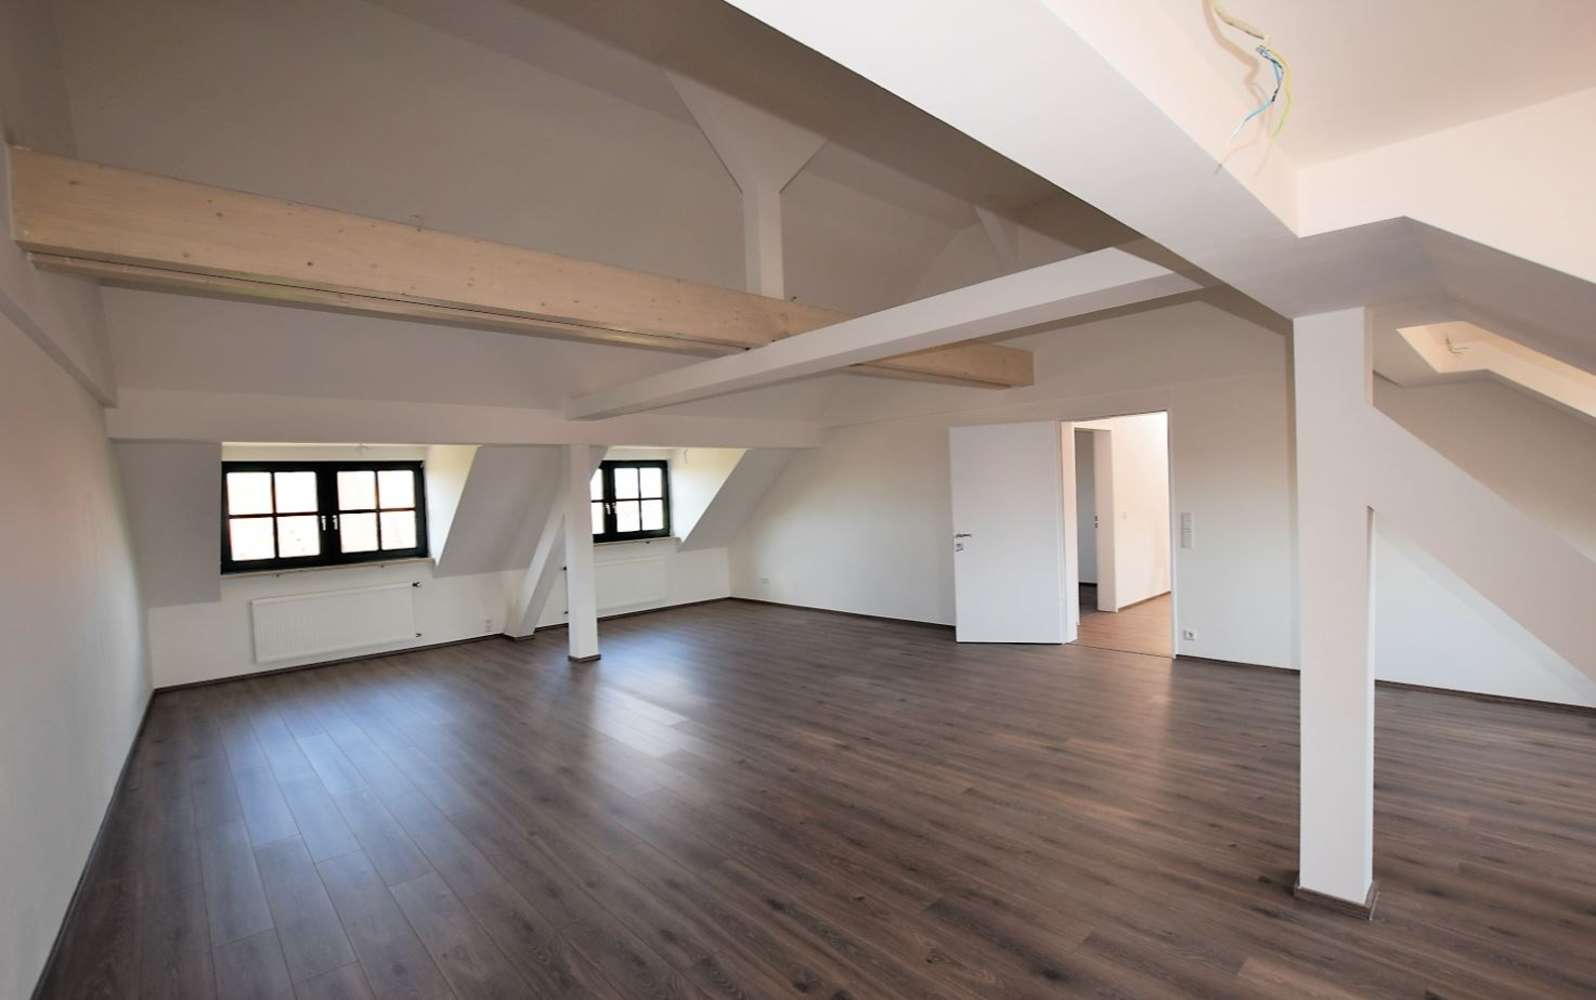 Büros Nürnberg, 90443 - Büro - Nürnberg, Tafelhof - M1018 - 10442972